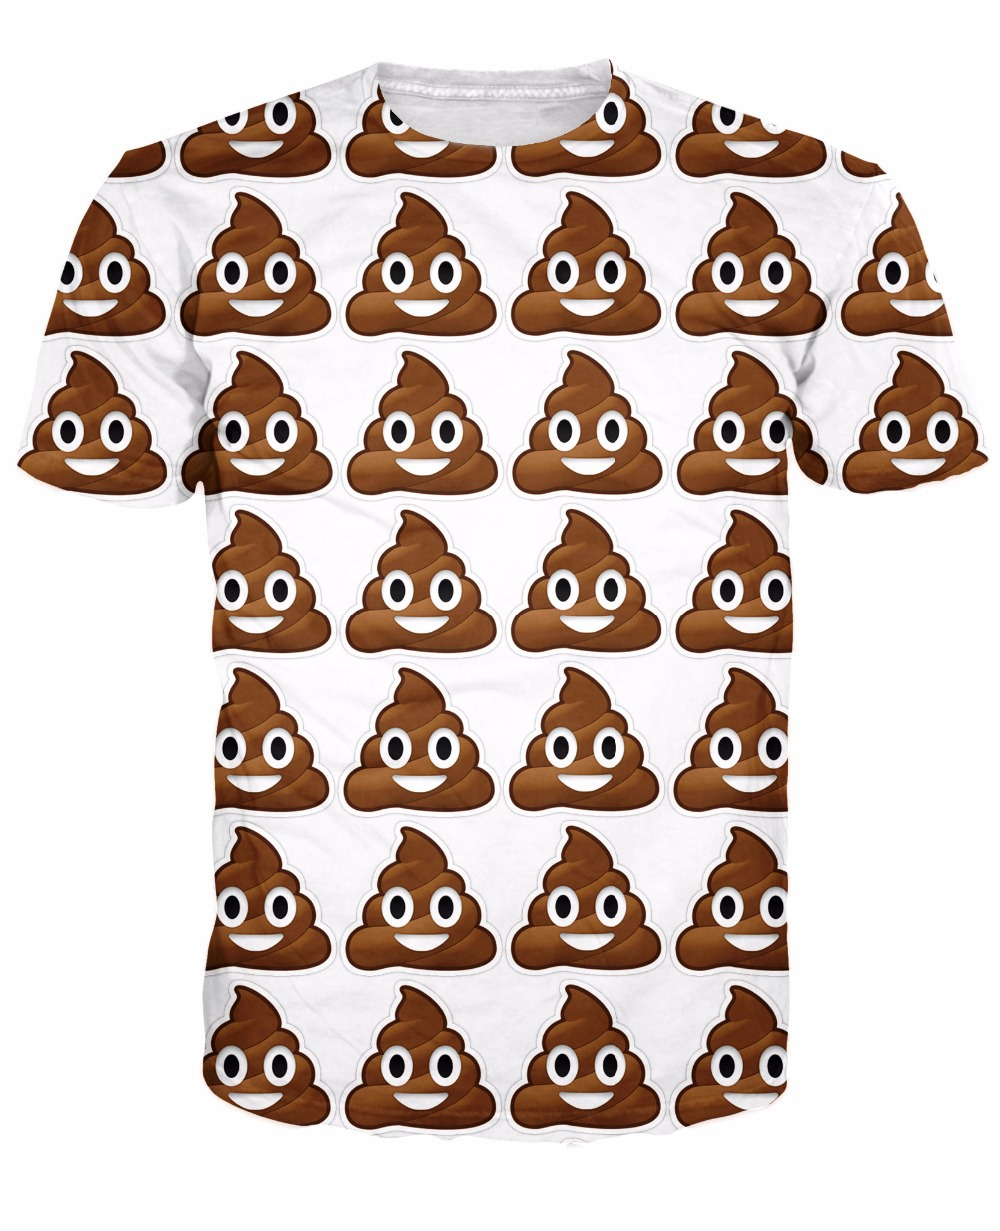 2018 new arrive Poop Emoji T-Shirt cute turd characters 3d print t shirt fashion clothing tops Summer Style tee for women men